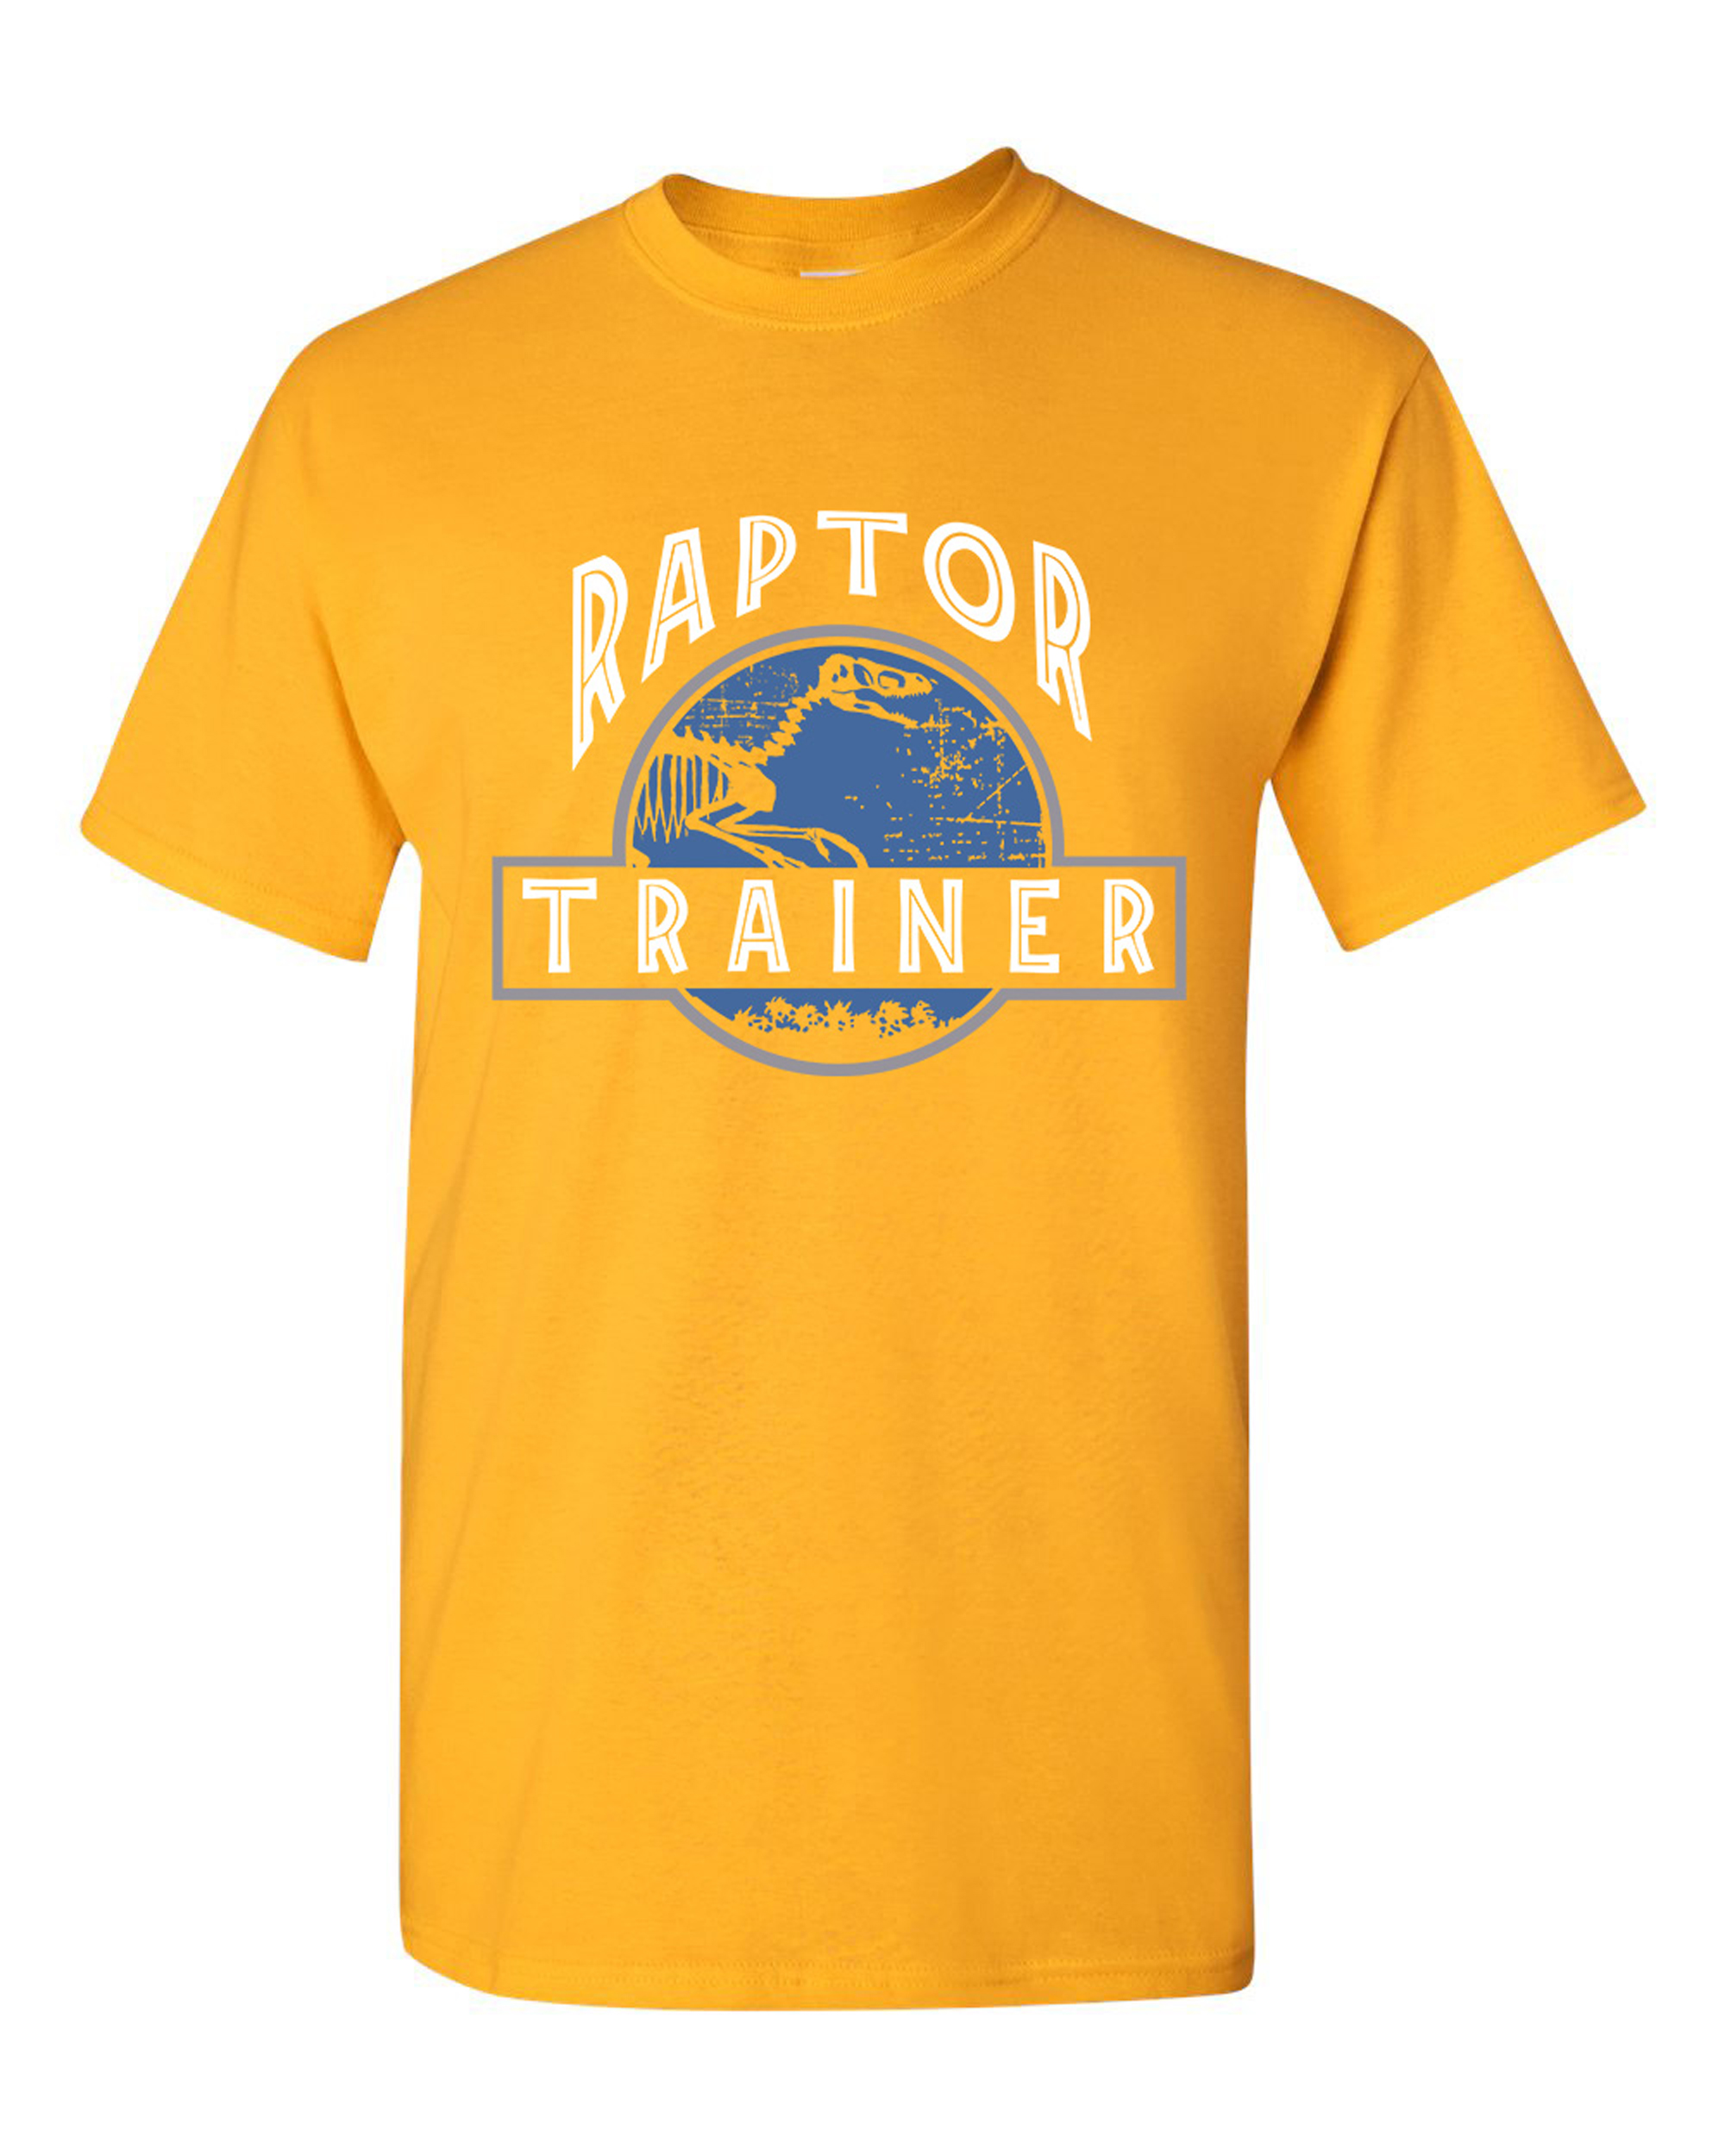 Raptor Trainer Dinosaur Movie Funny Humor DT Adult T-Shirt Tee